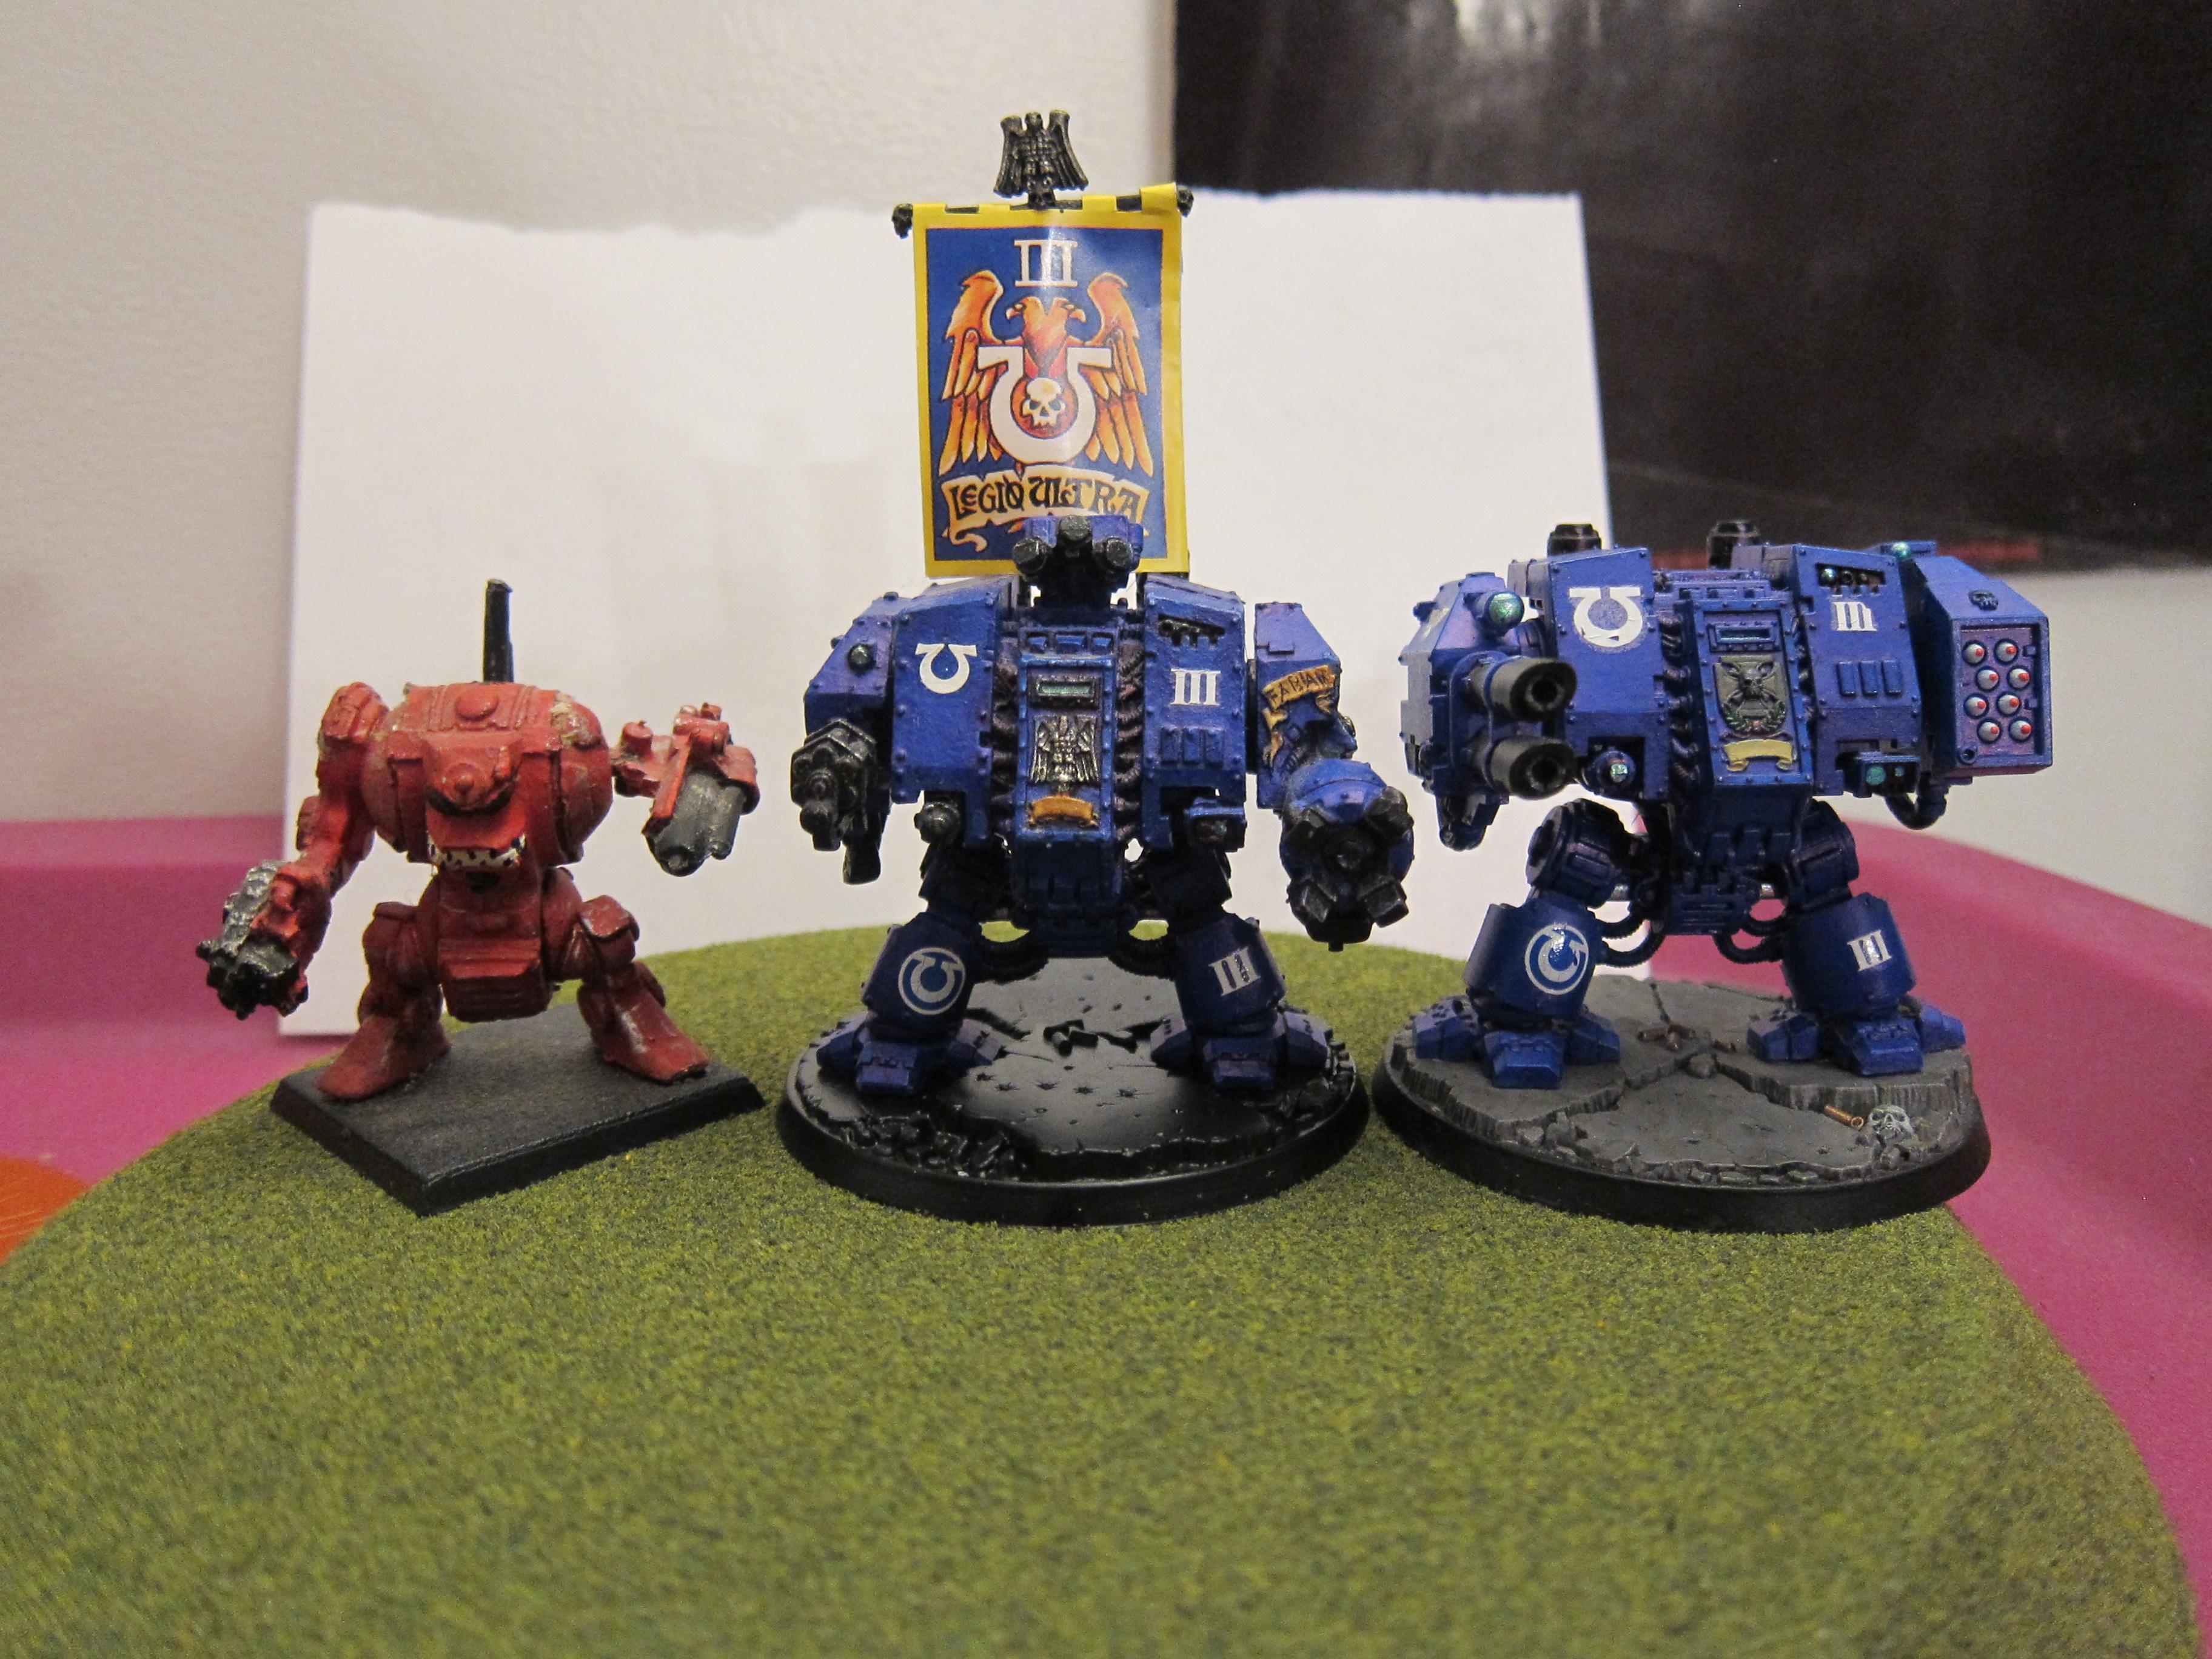 Dreadnought, Space Marines, Ultramarines, Warhammer 40,000